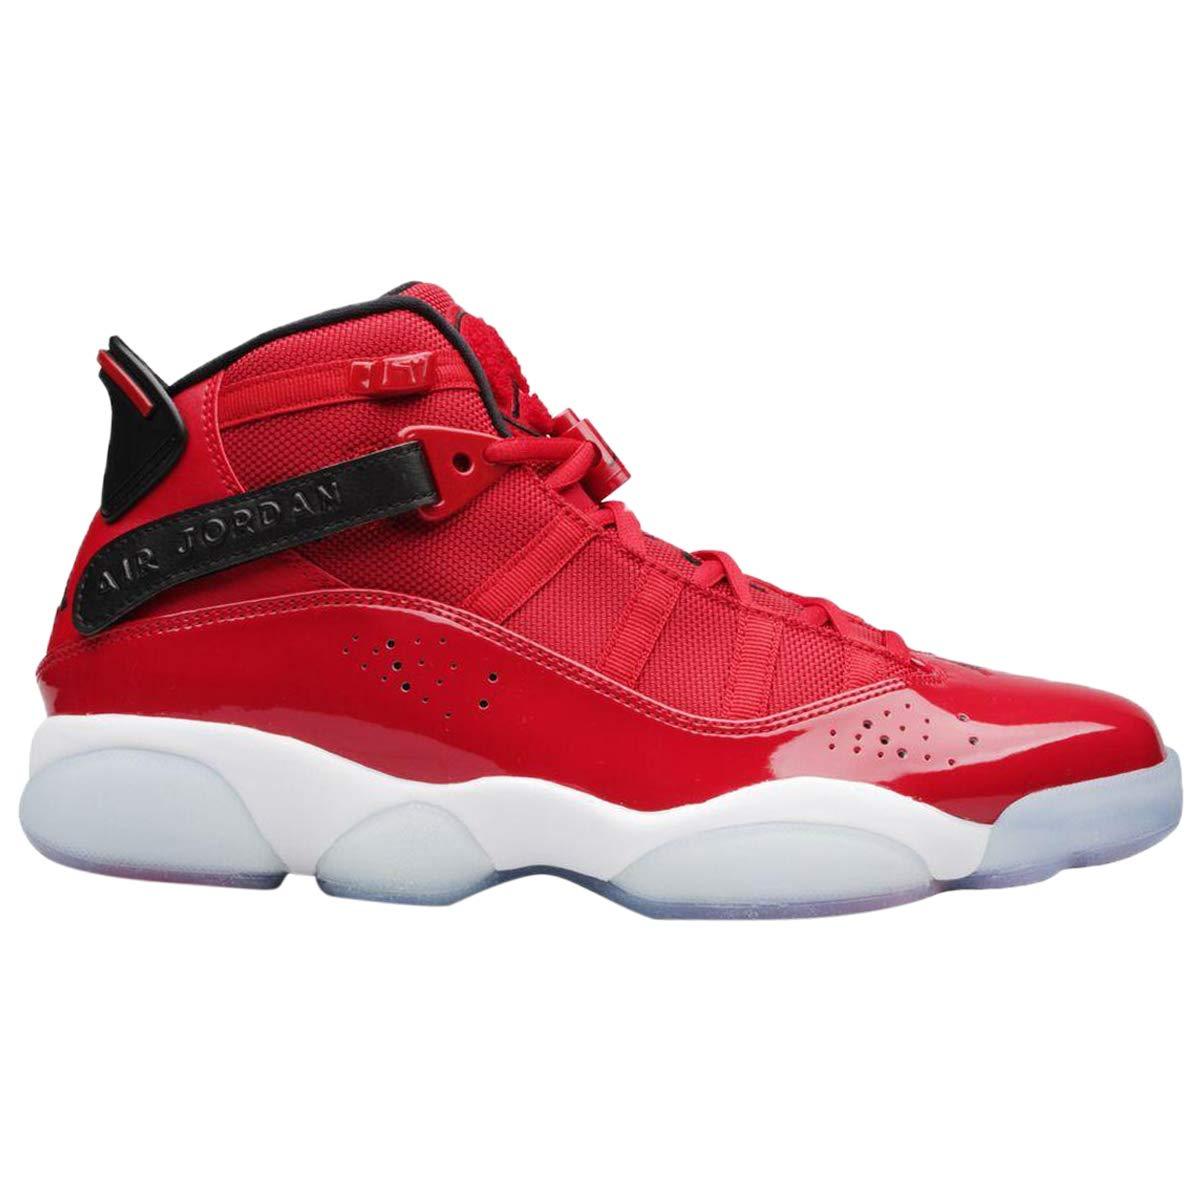 16874d6b639 Amazon.com | Jordan 322992-601: Men's Gym Red/Black/White 6 Rings Sneakers  | Shoes